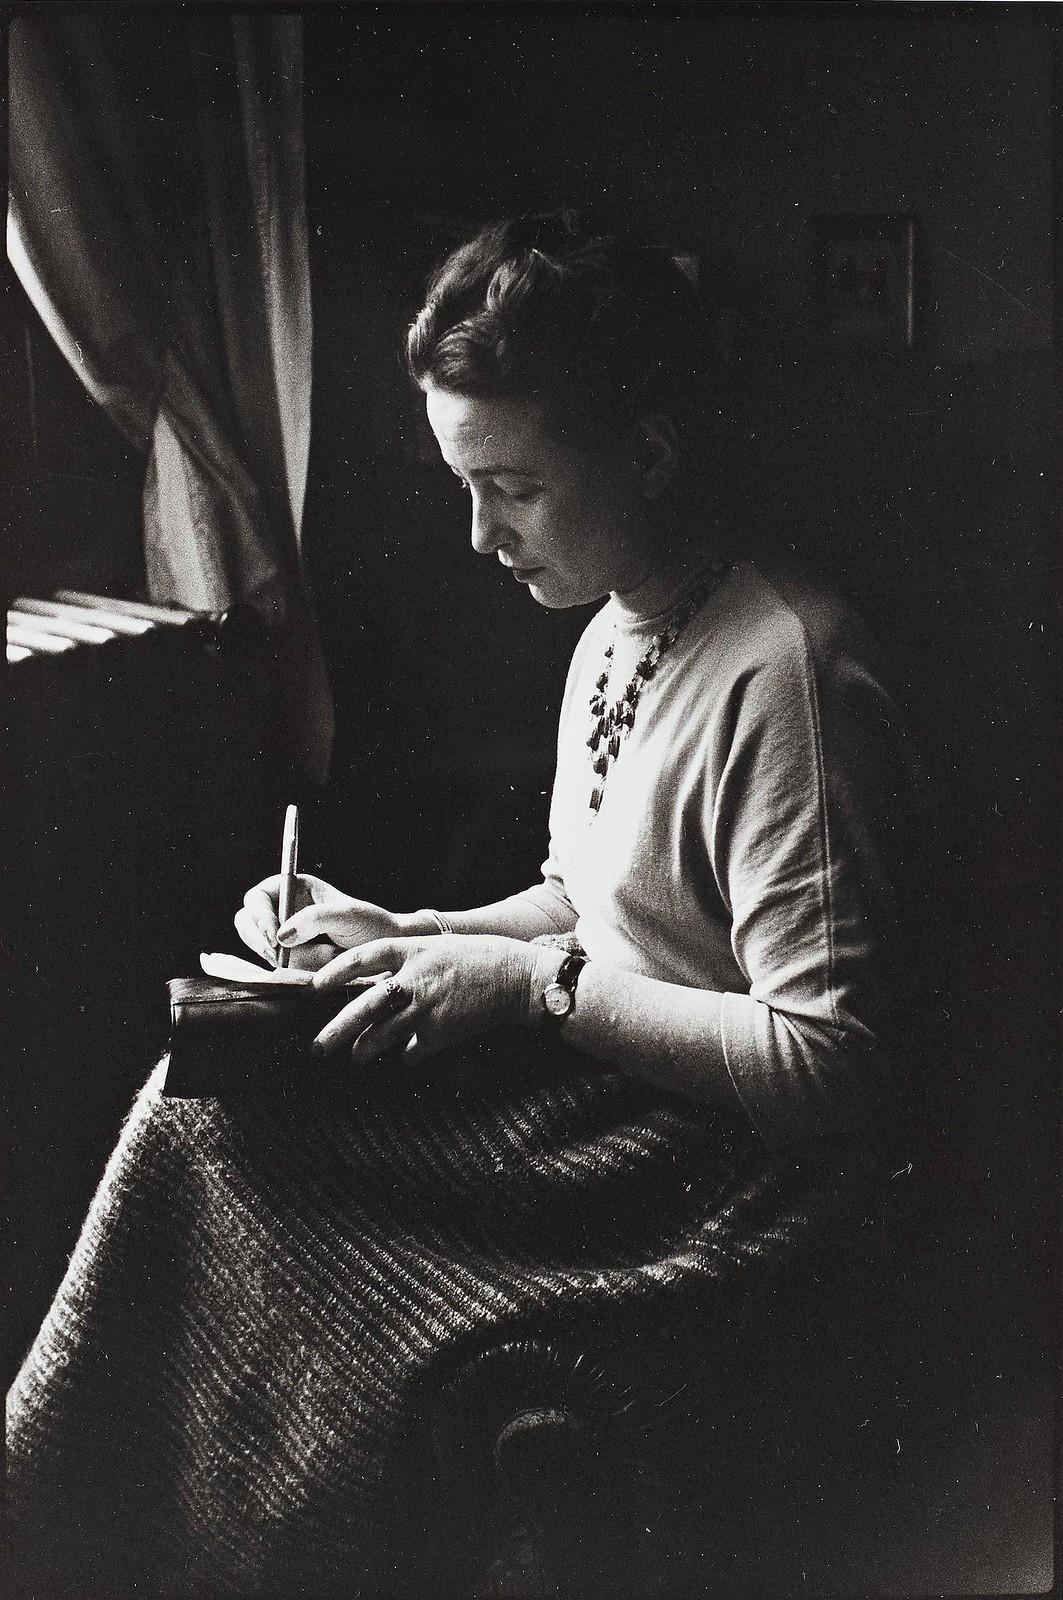 1954. Симона де Бовуар, Приз-де-Гонкур, Париж